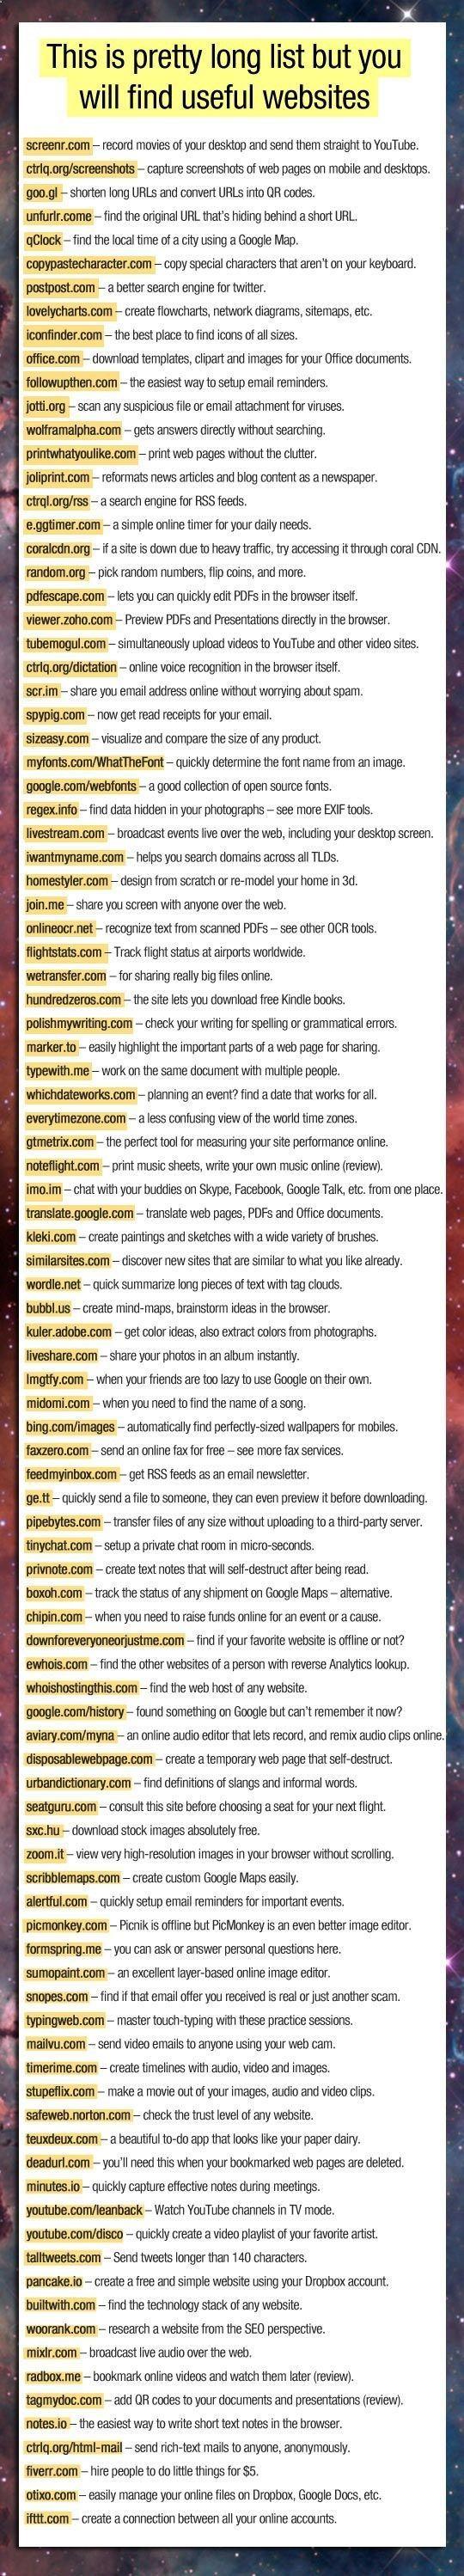 Take a Sec To Check This Amazing List: